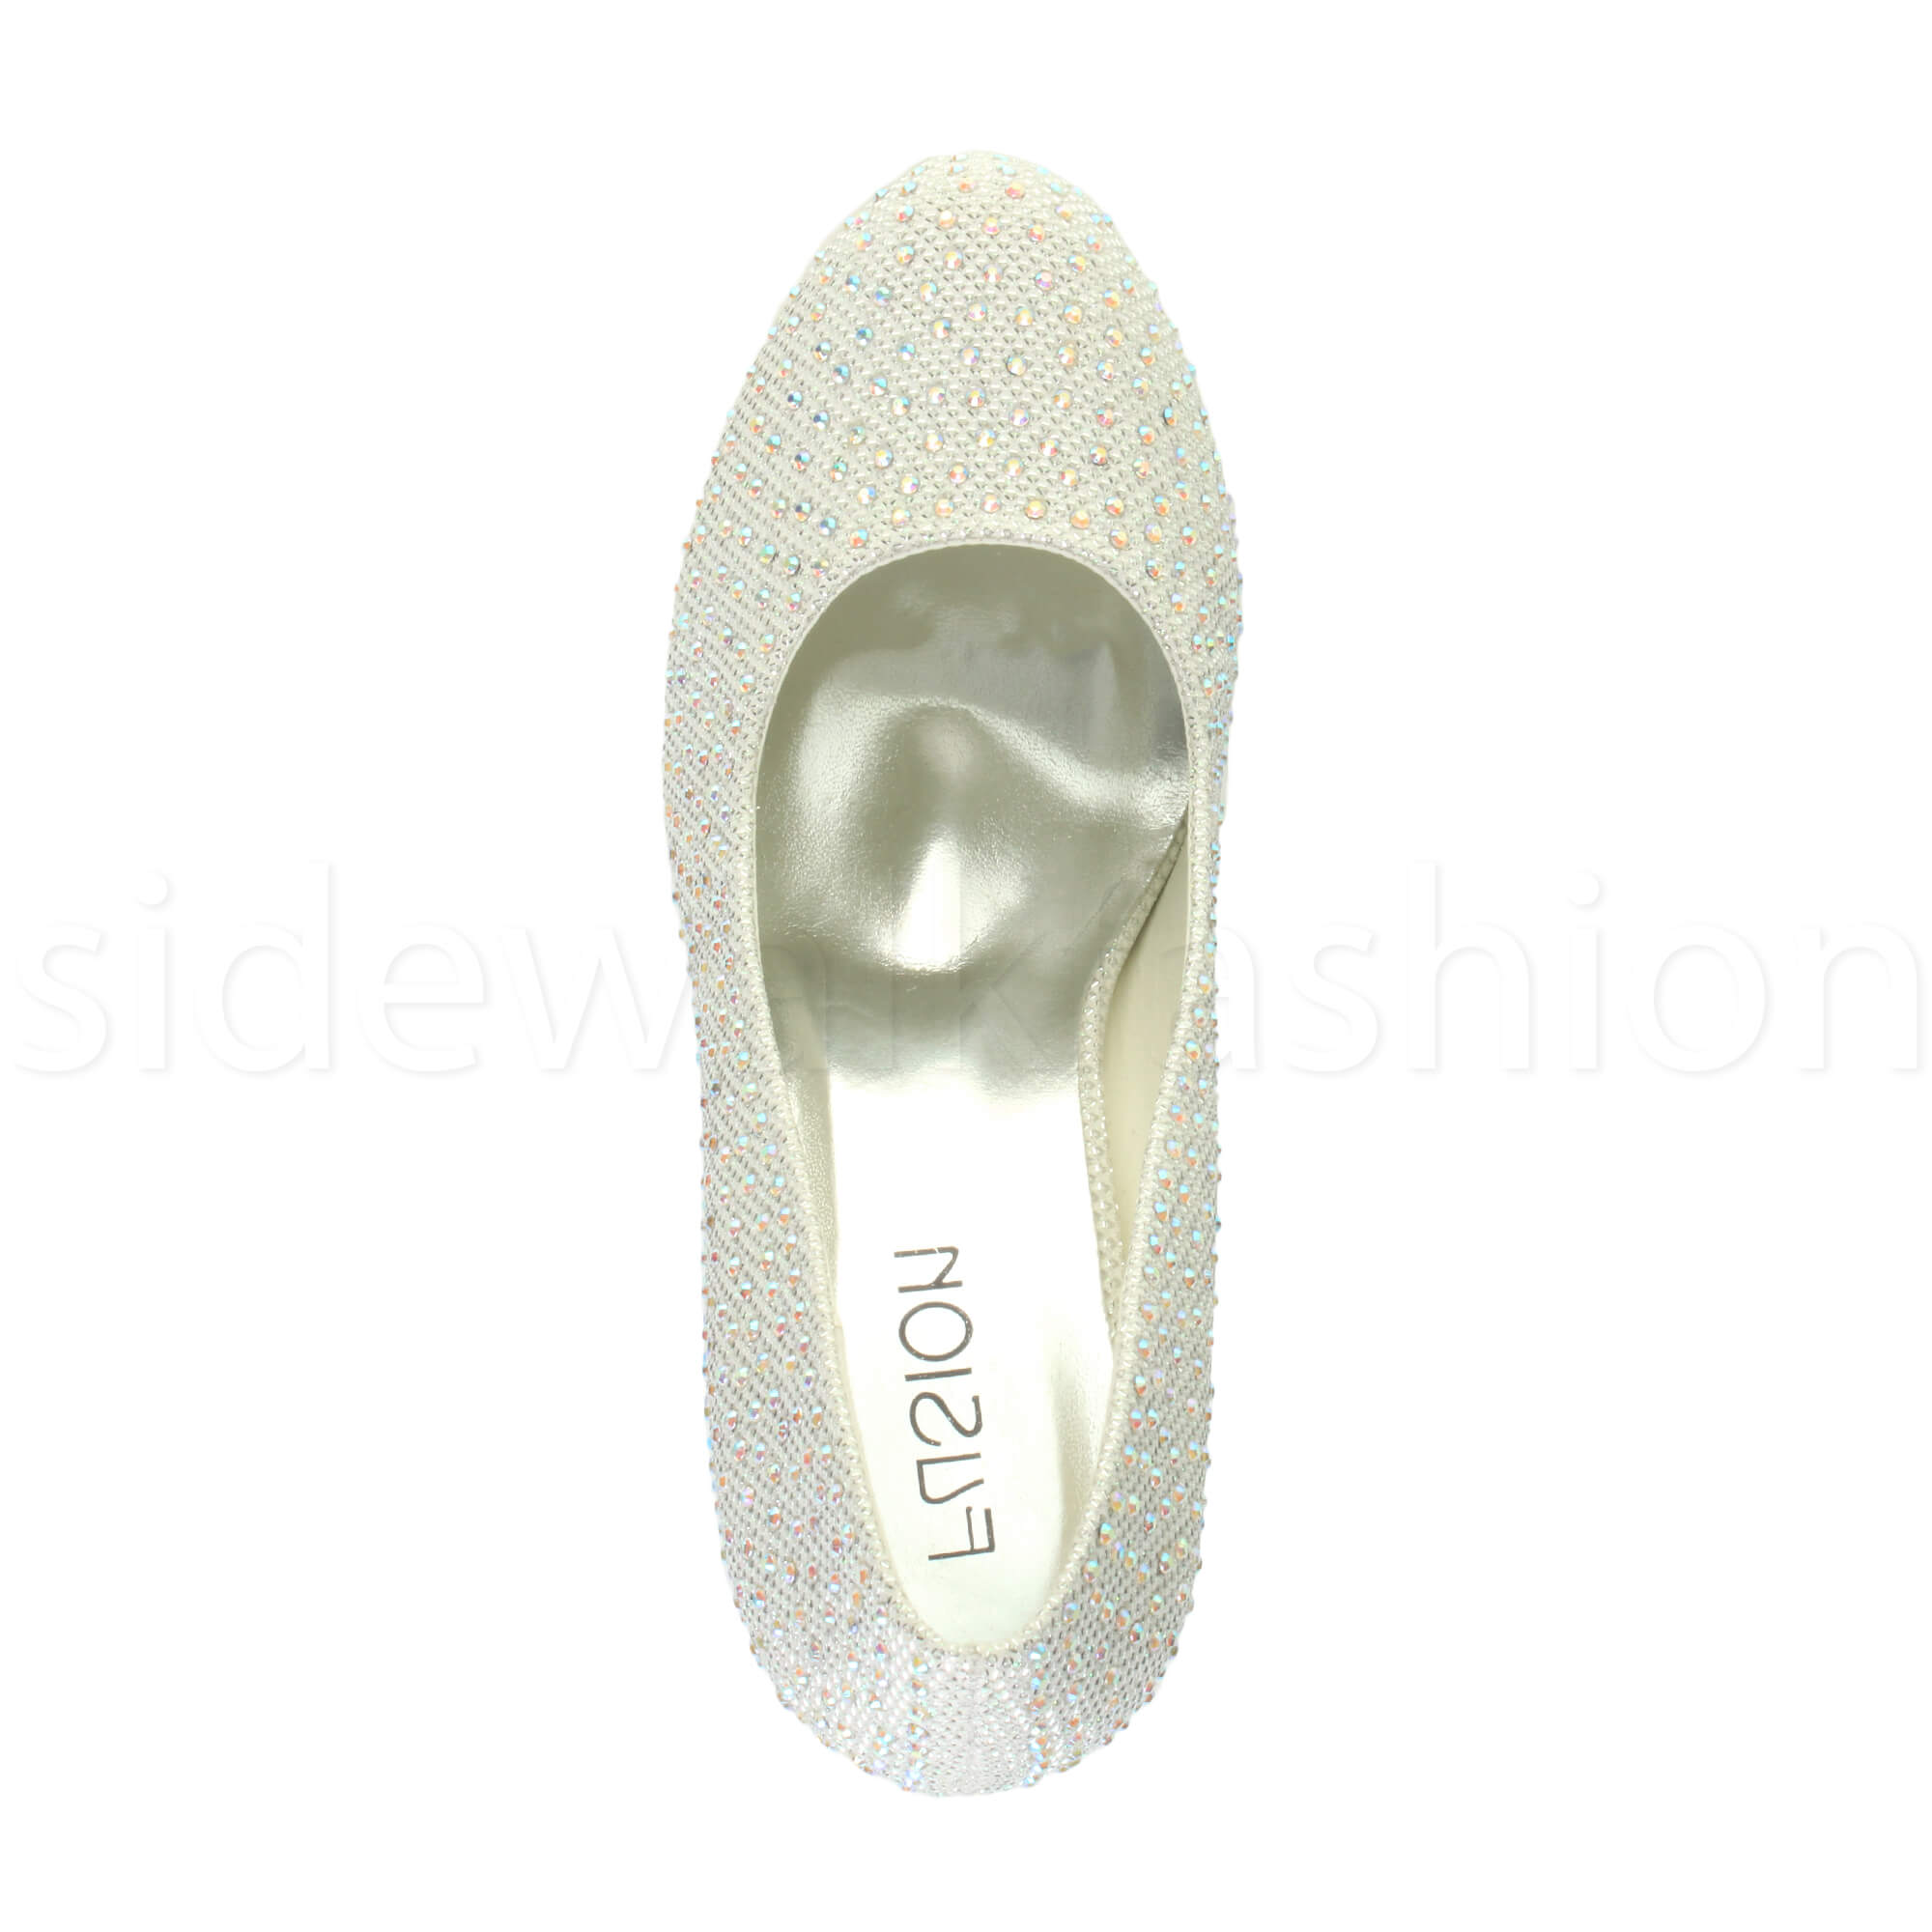 Womens-ladies-high-mid-heel-platform-wedding-evening-bridesmaid-court-shoes-size thumbnail 91